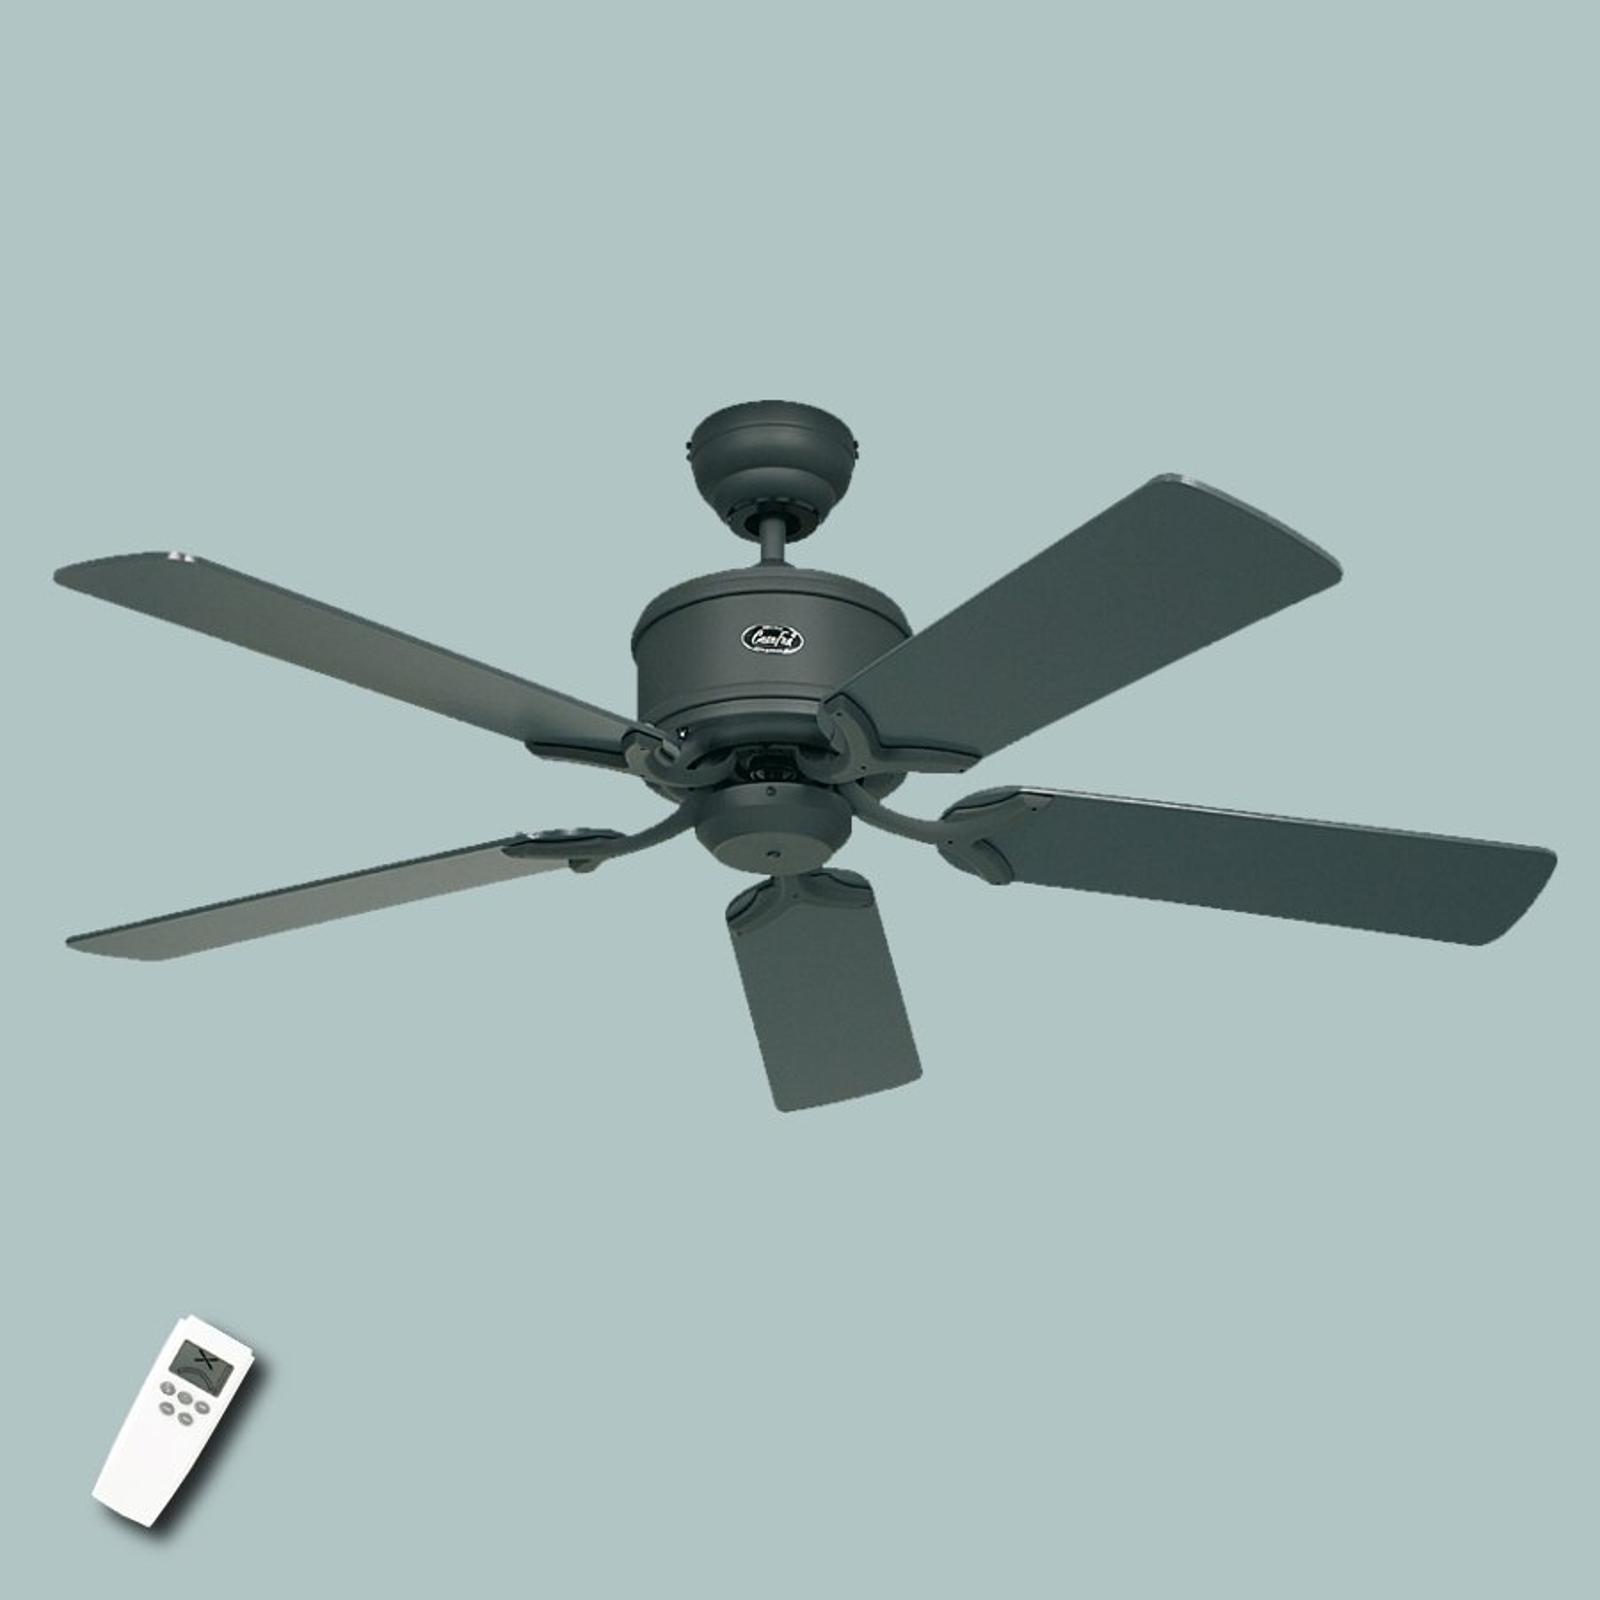 Úsporný stropní ventilátor Eco Elements, šedobílá